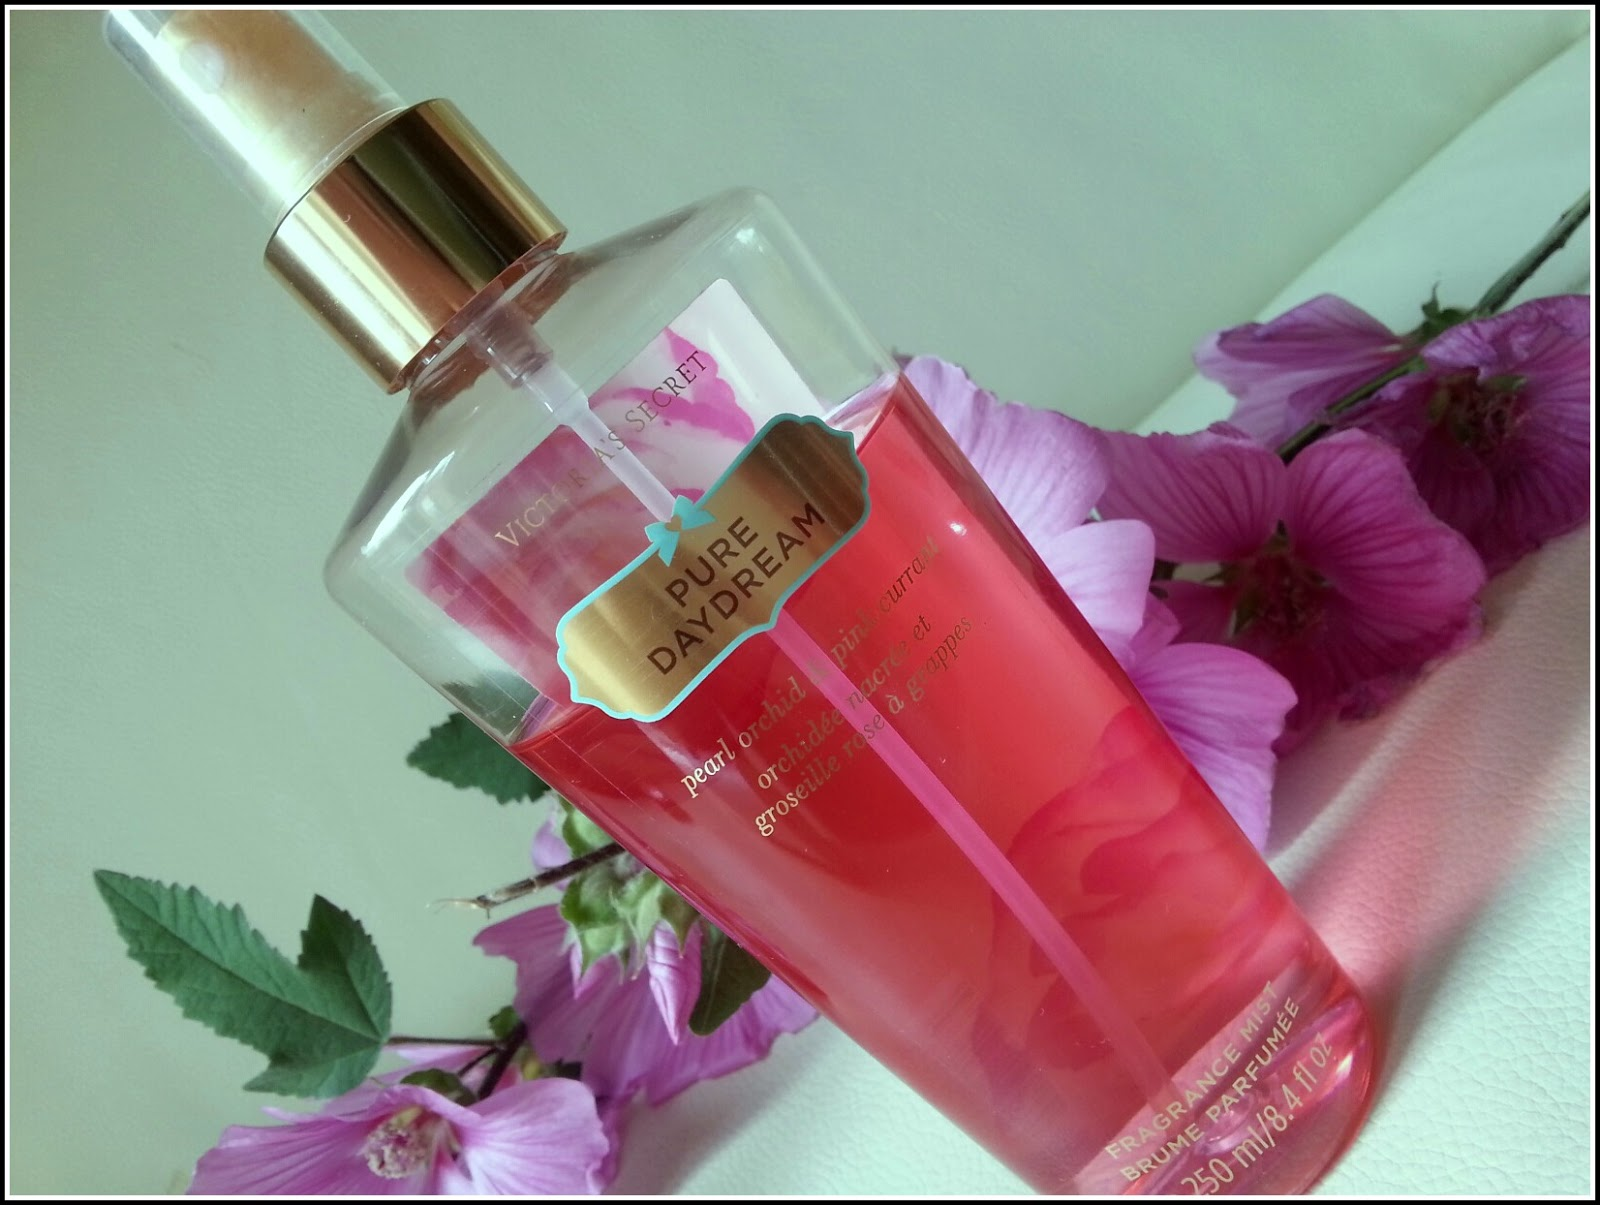 Victoria's Secret Pure Daydream Fragrance Mist